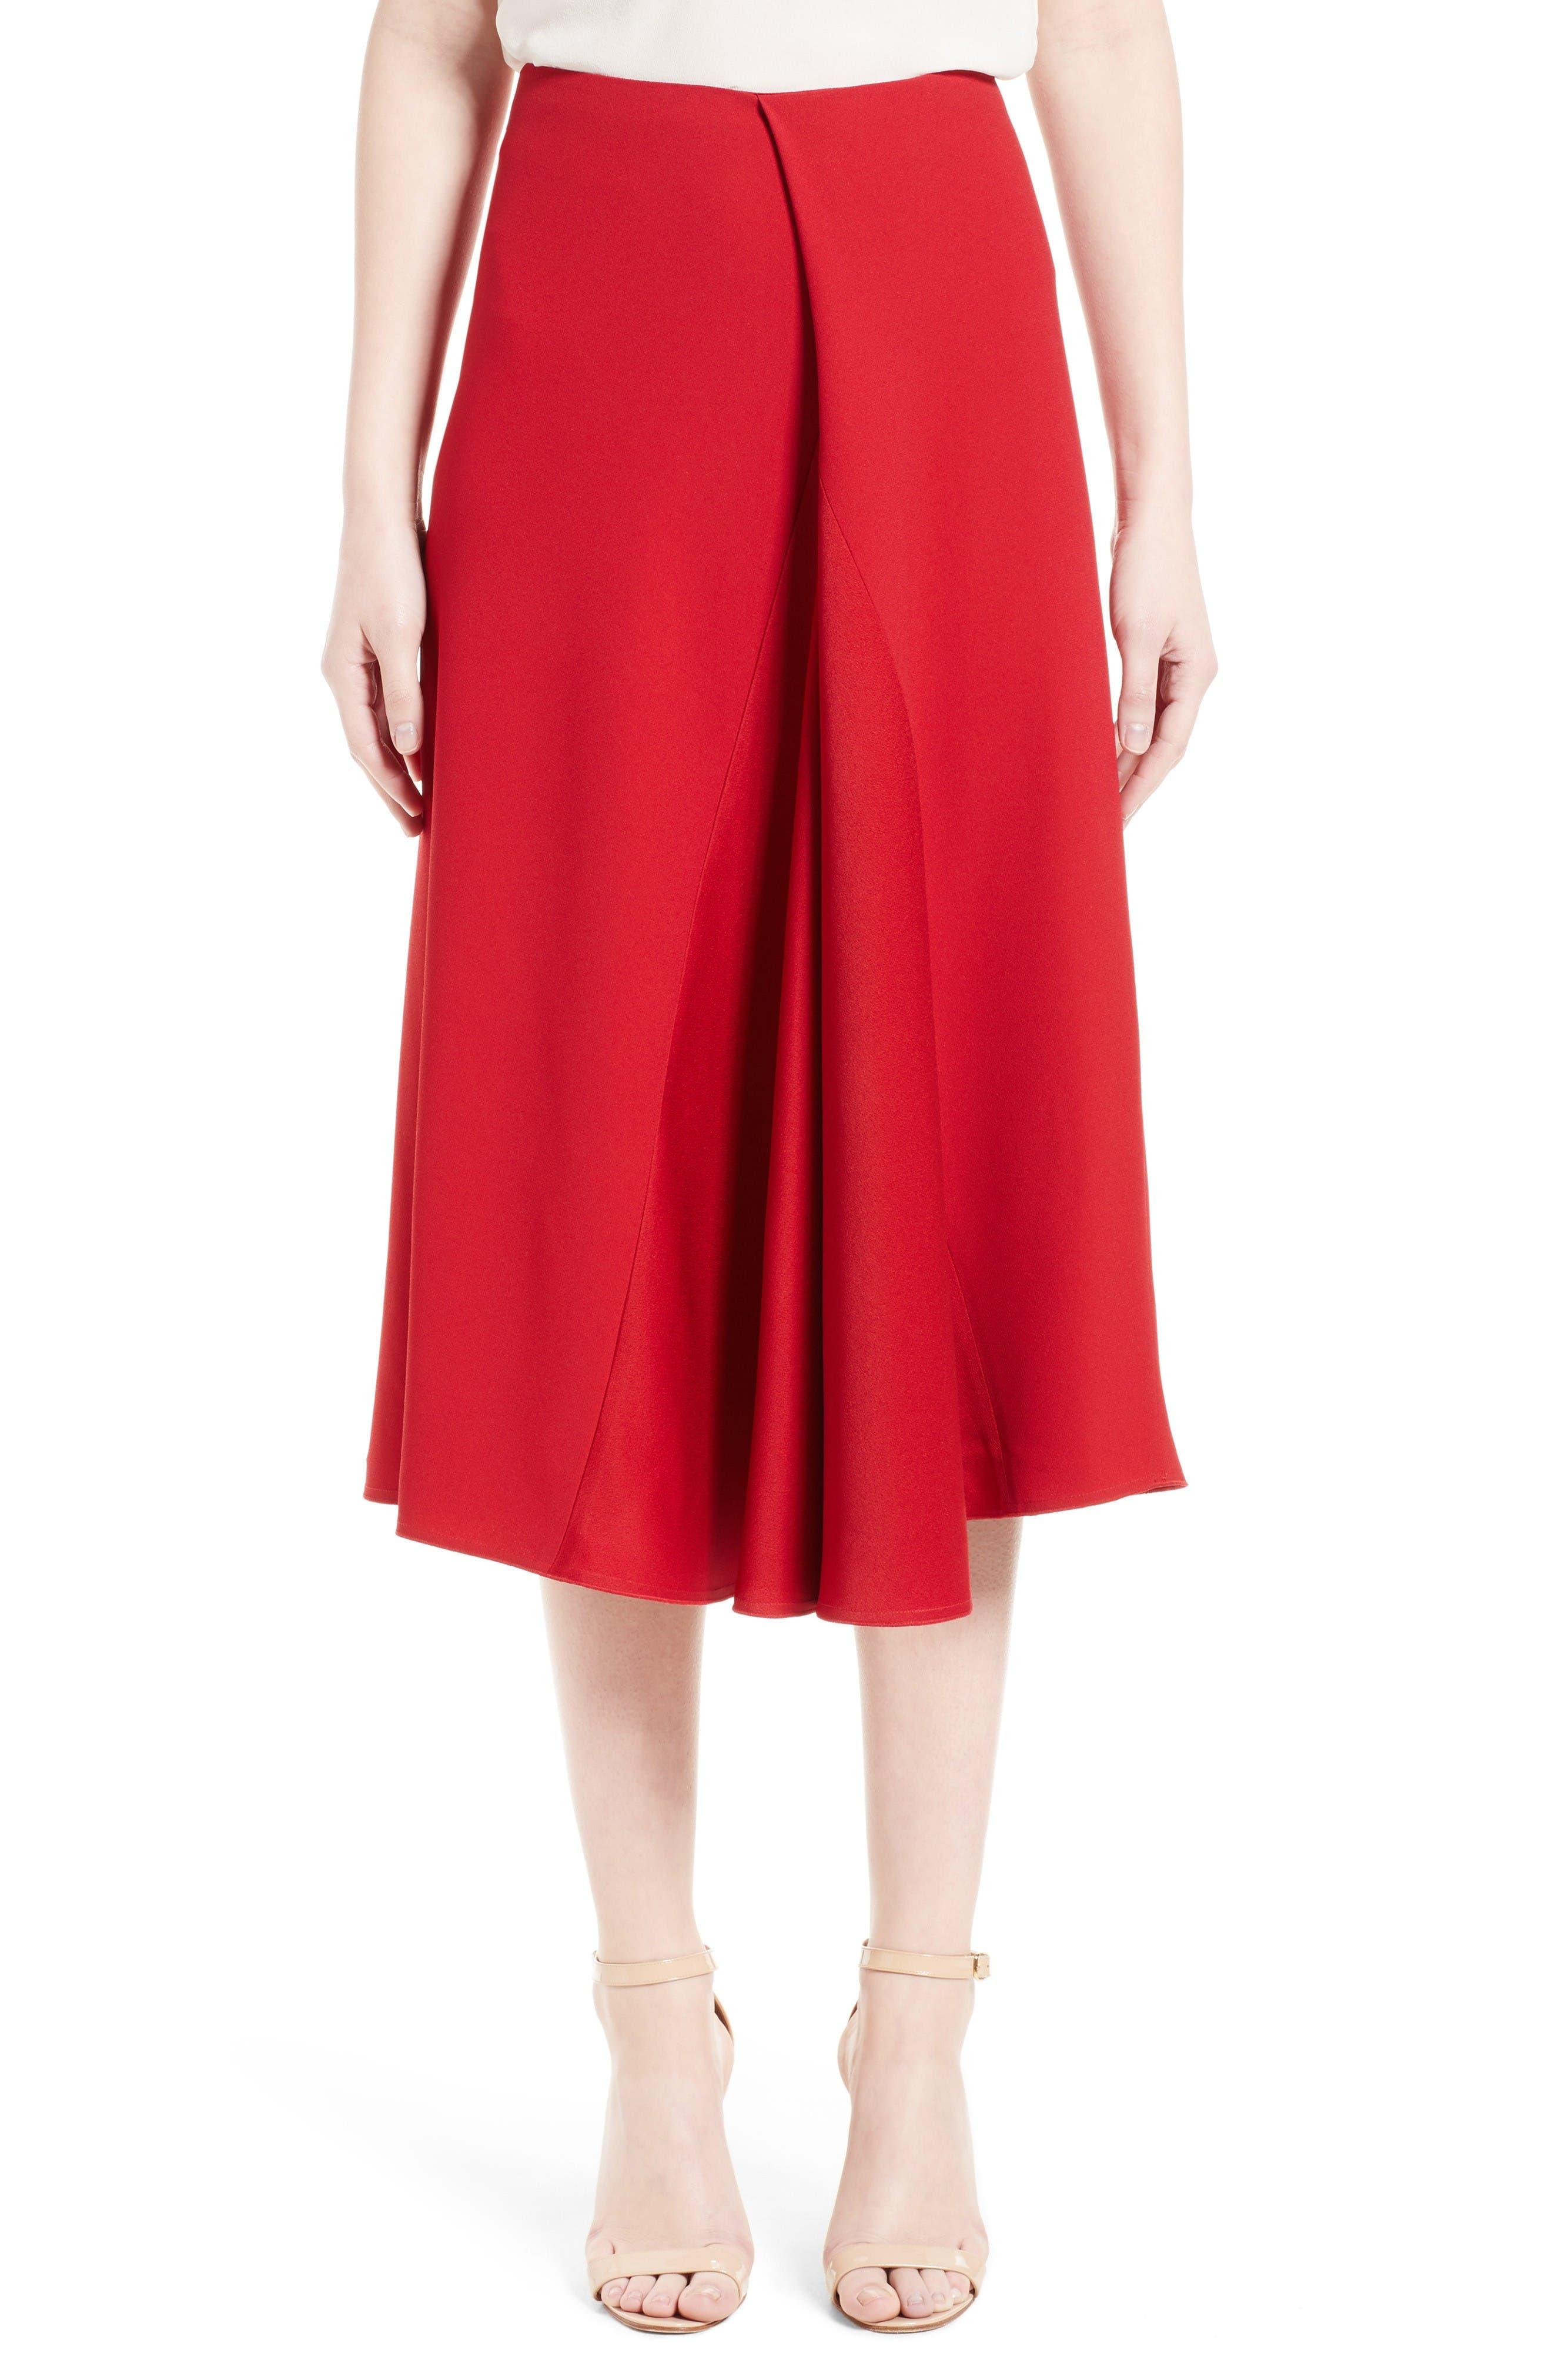 Alternate Image 1 Selected - Victoria Beckham Satin Crepe Godet Skirt